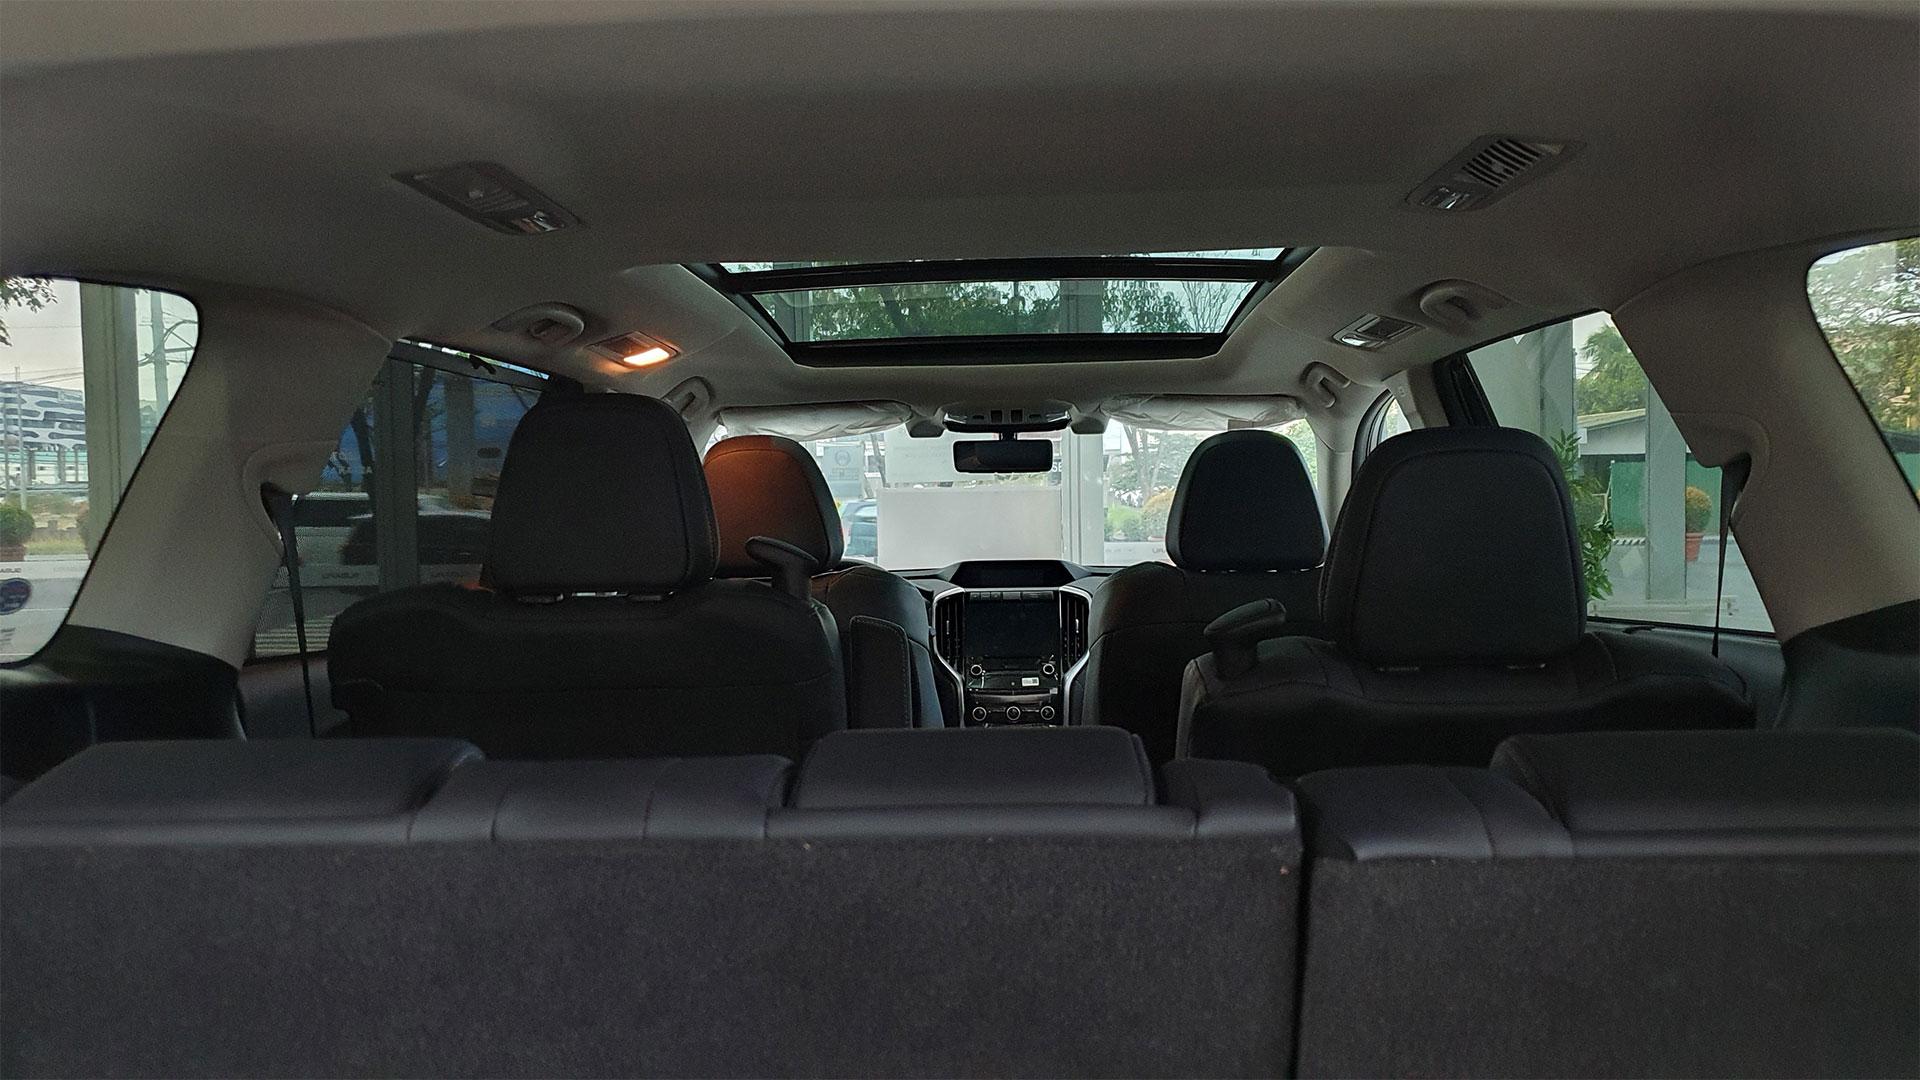 The Subaru Evoltis Interior POV from the open rear door